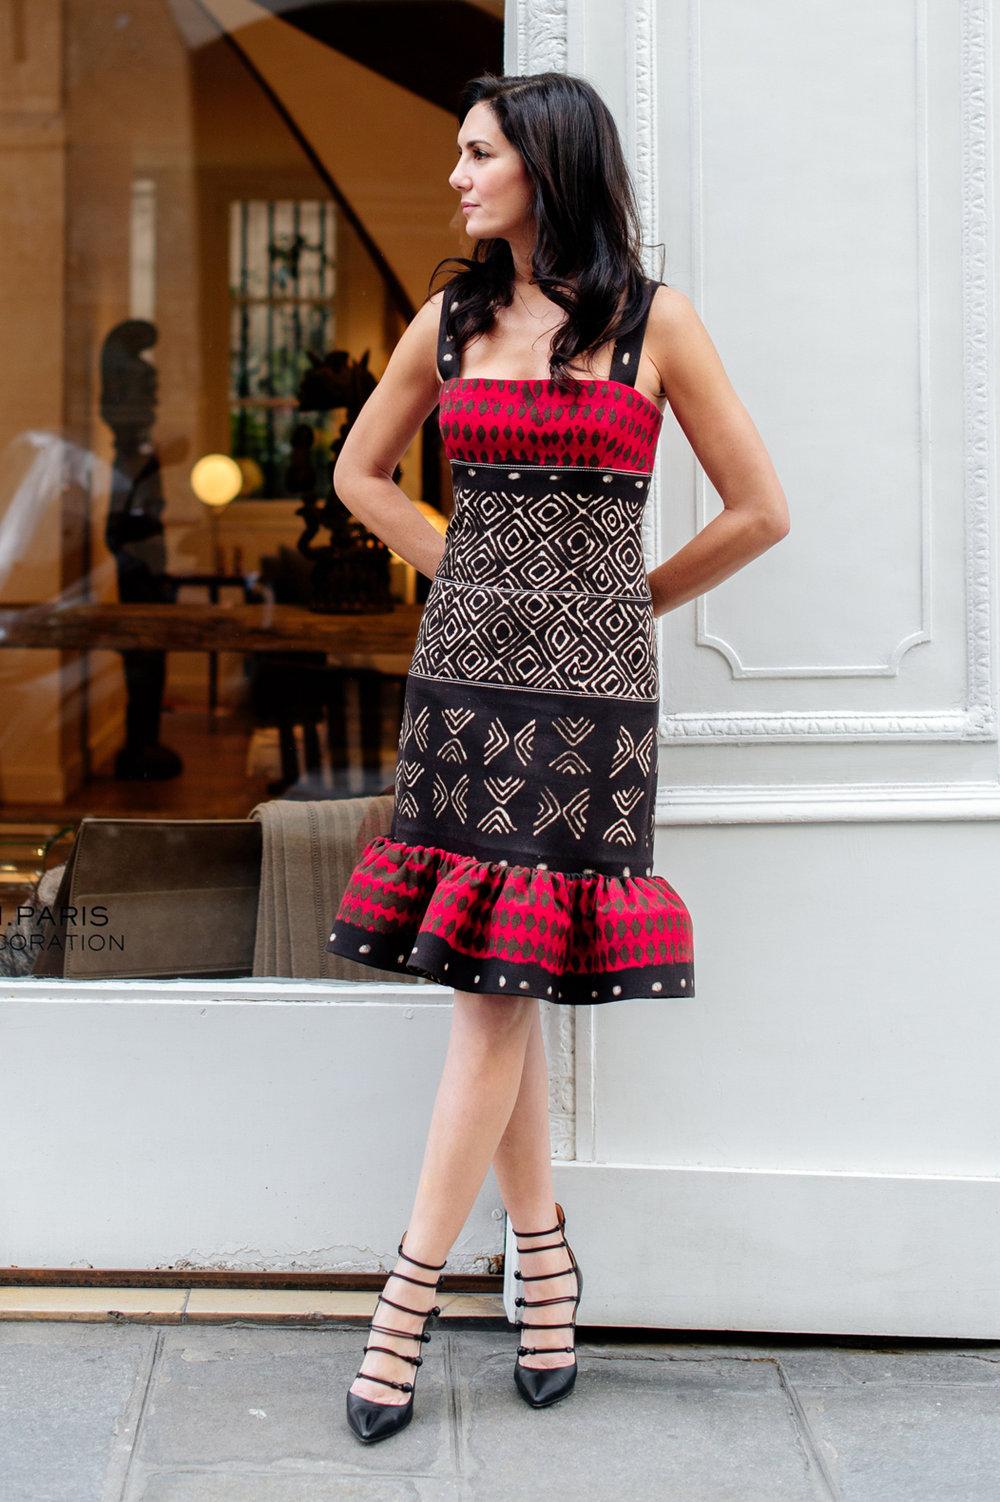 Oscar de la Renta cotton/canvas ethnic print dress